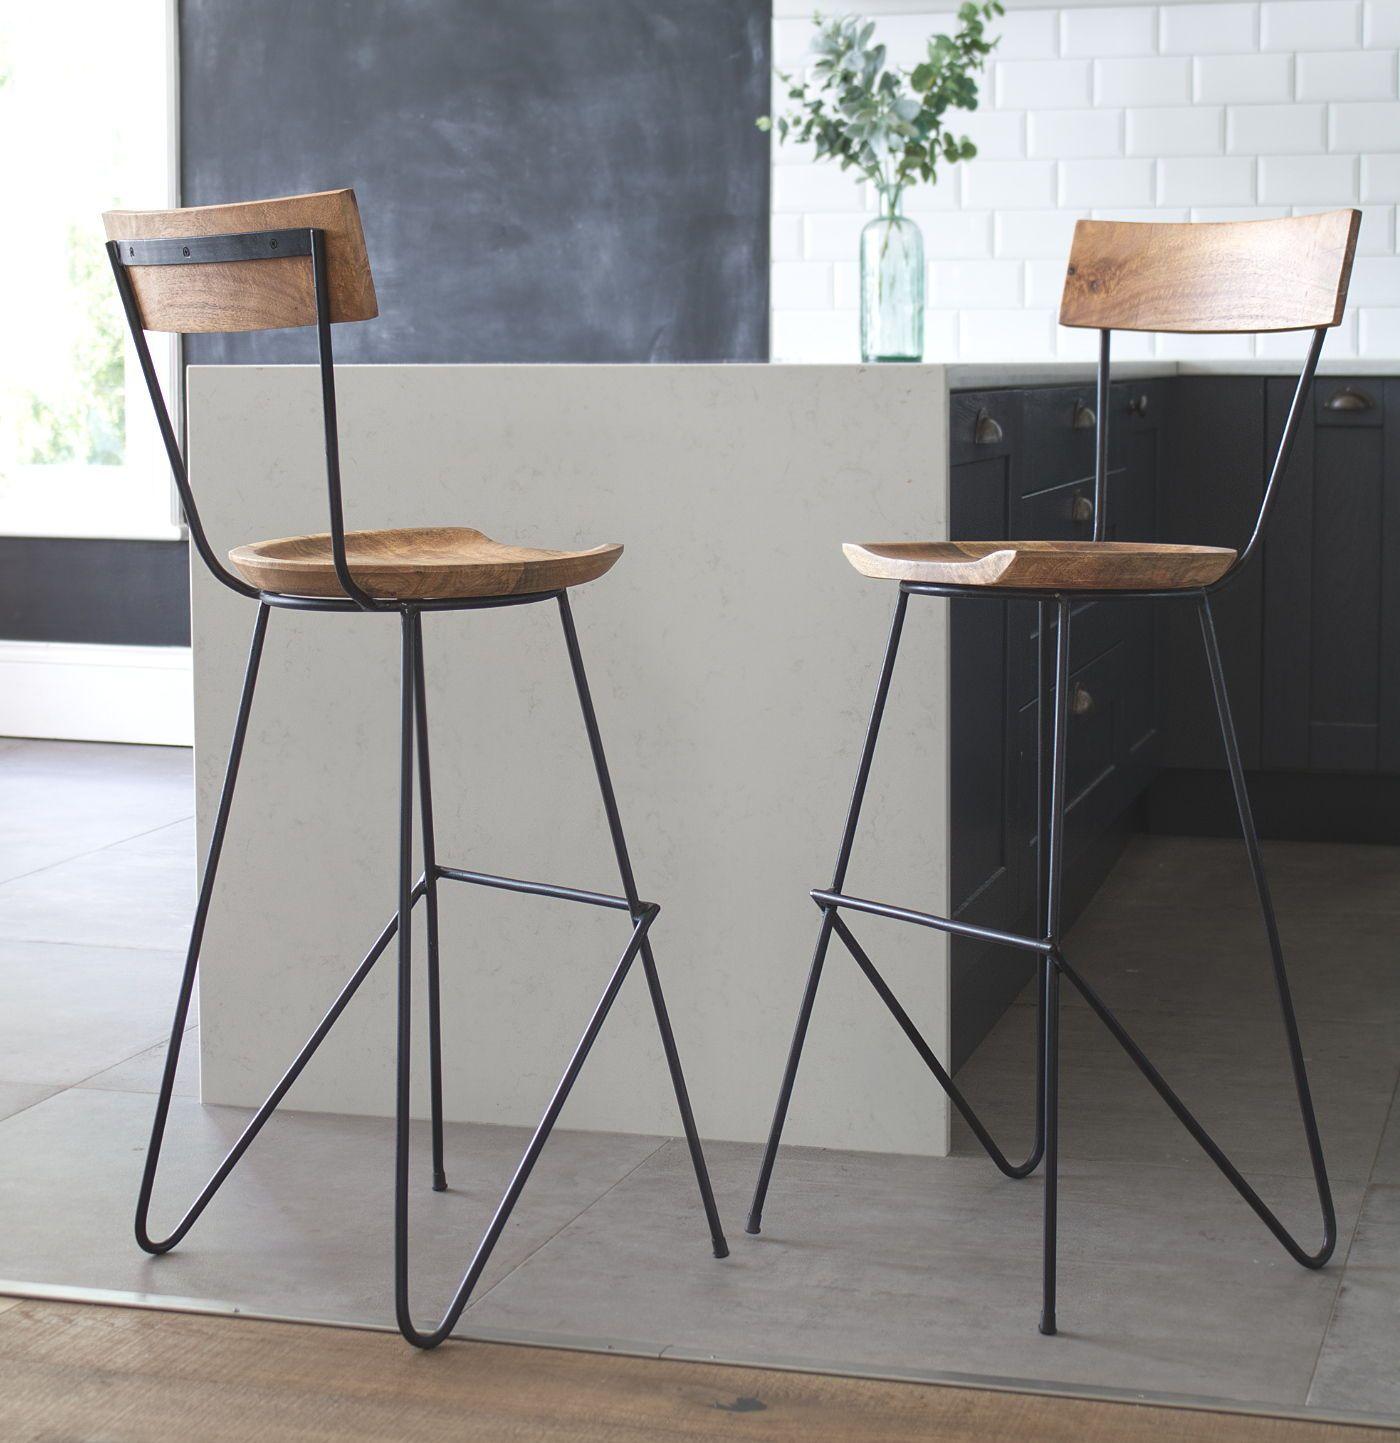 Stoker Bar Stool With Backrest Vaunt Design Designer Bar Stools Wooden Bar Stools Industrial Bar Stools